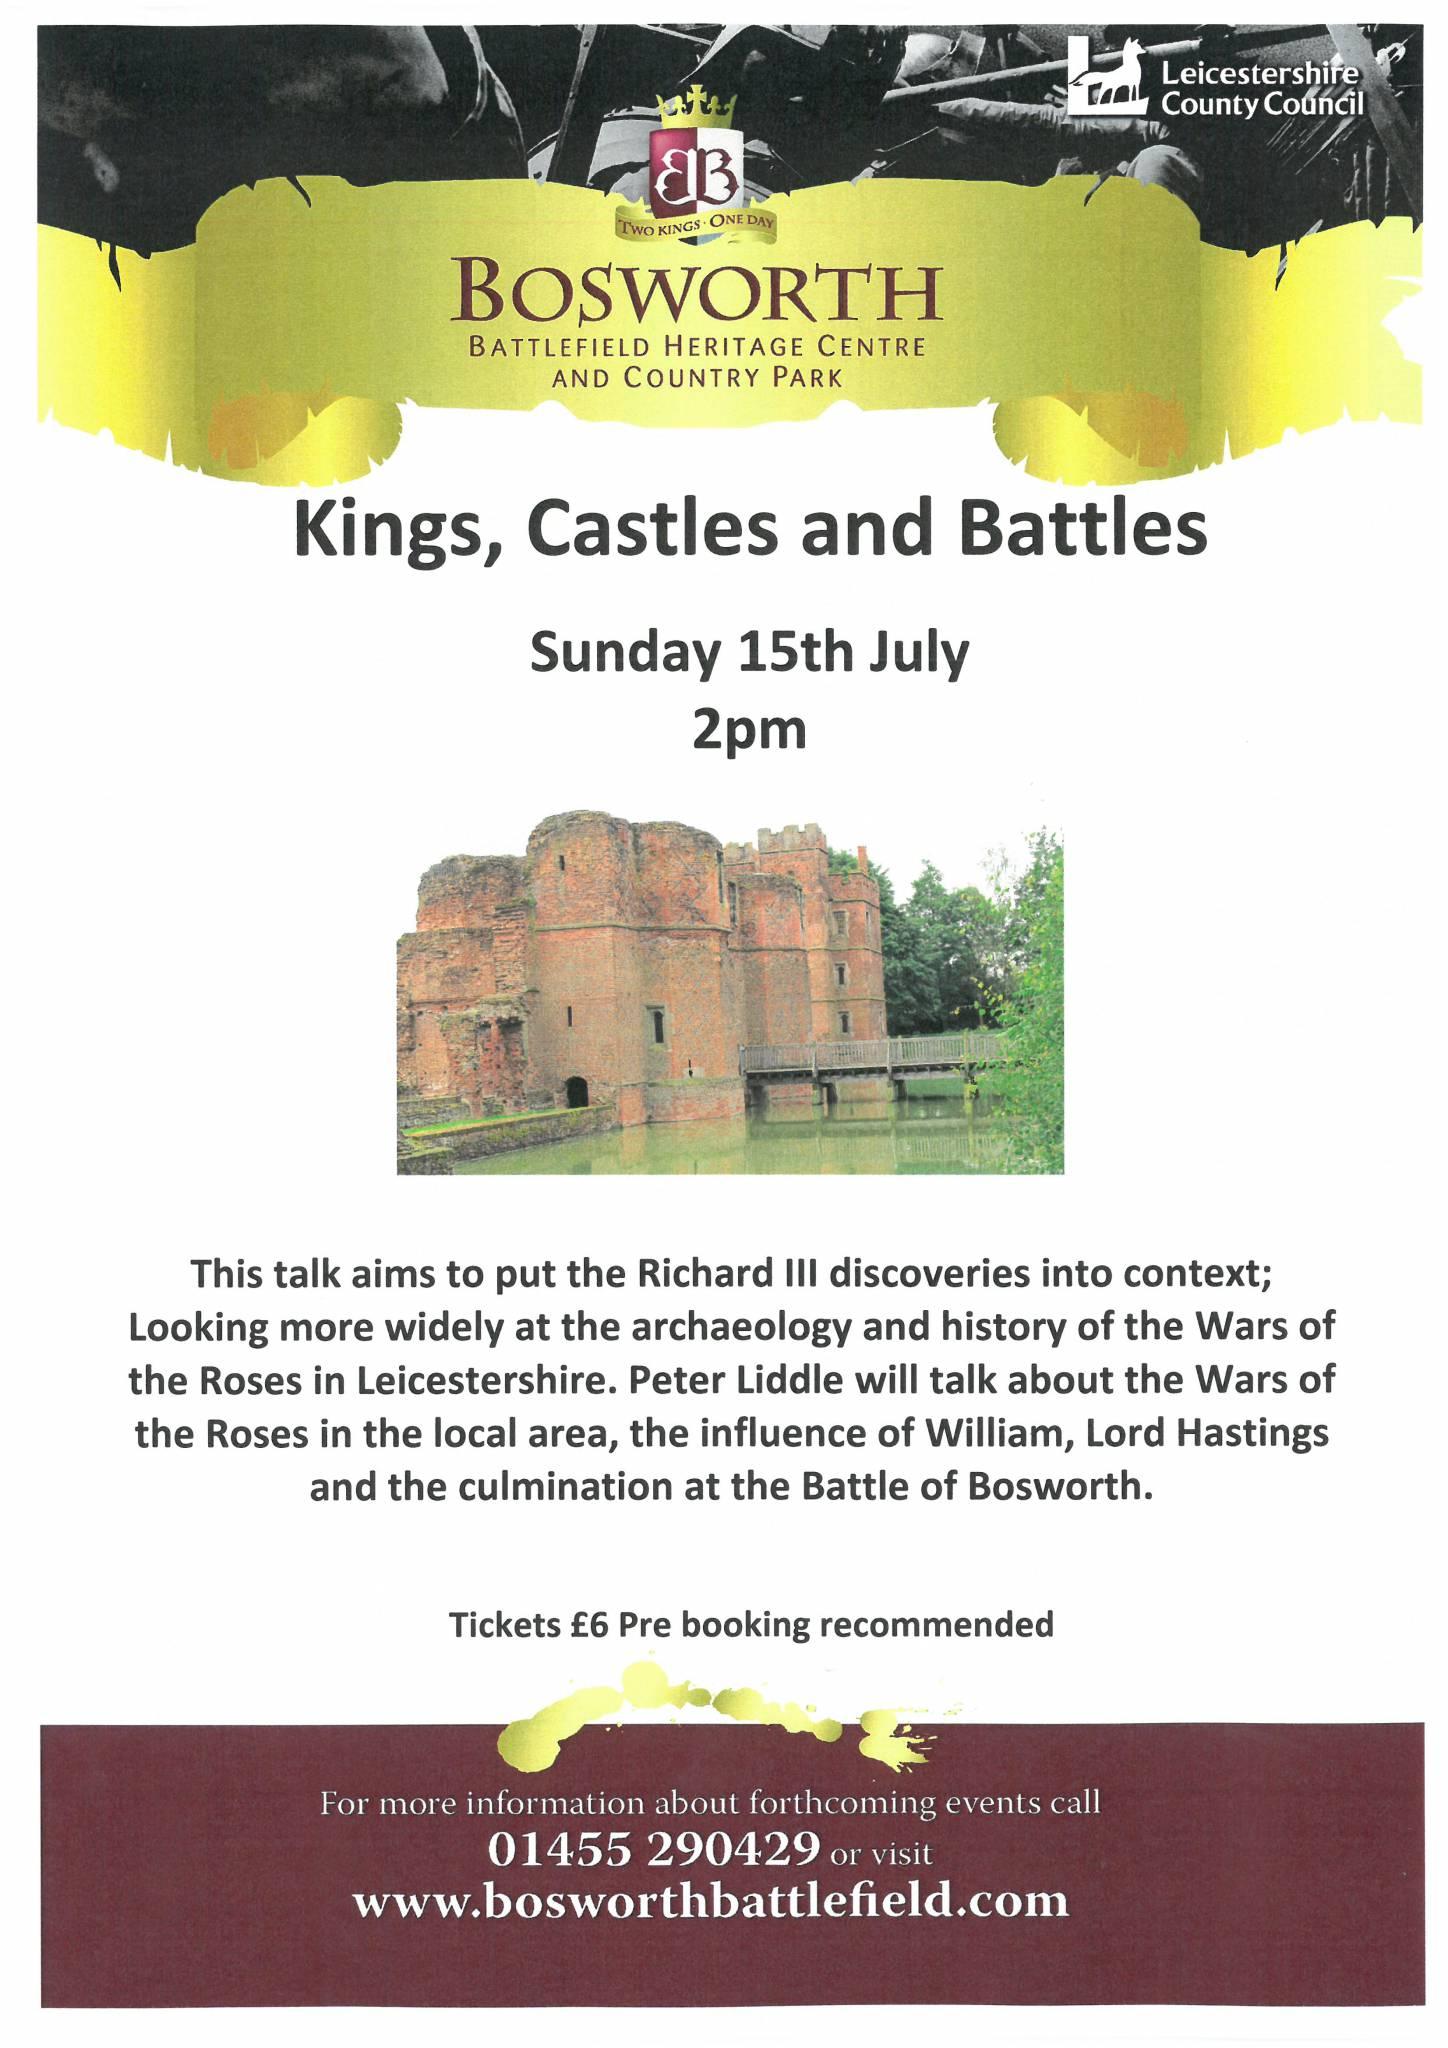 Festival of British Archaeology: Kings, Castles & Battles Talk